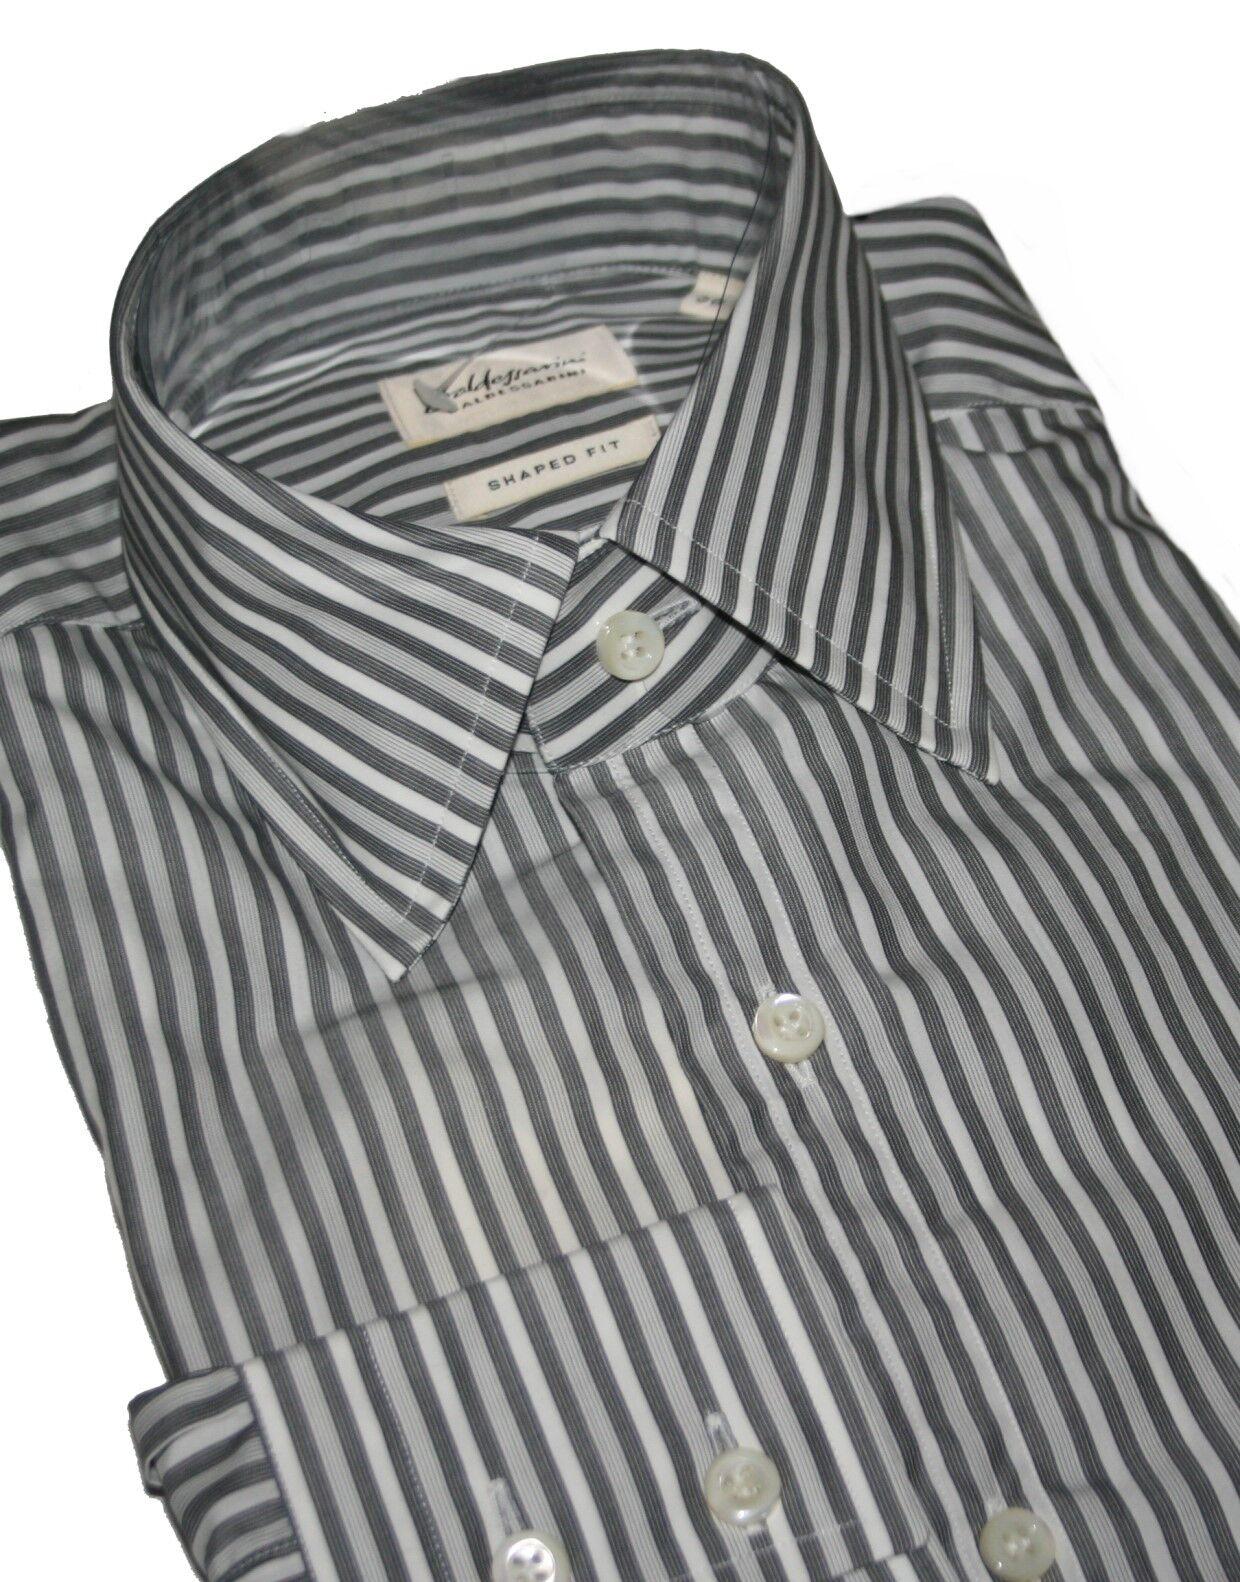 Baldessarini Signature Camicia 26 Shaped Fit Hemd KW.38  | Charakteristisch